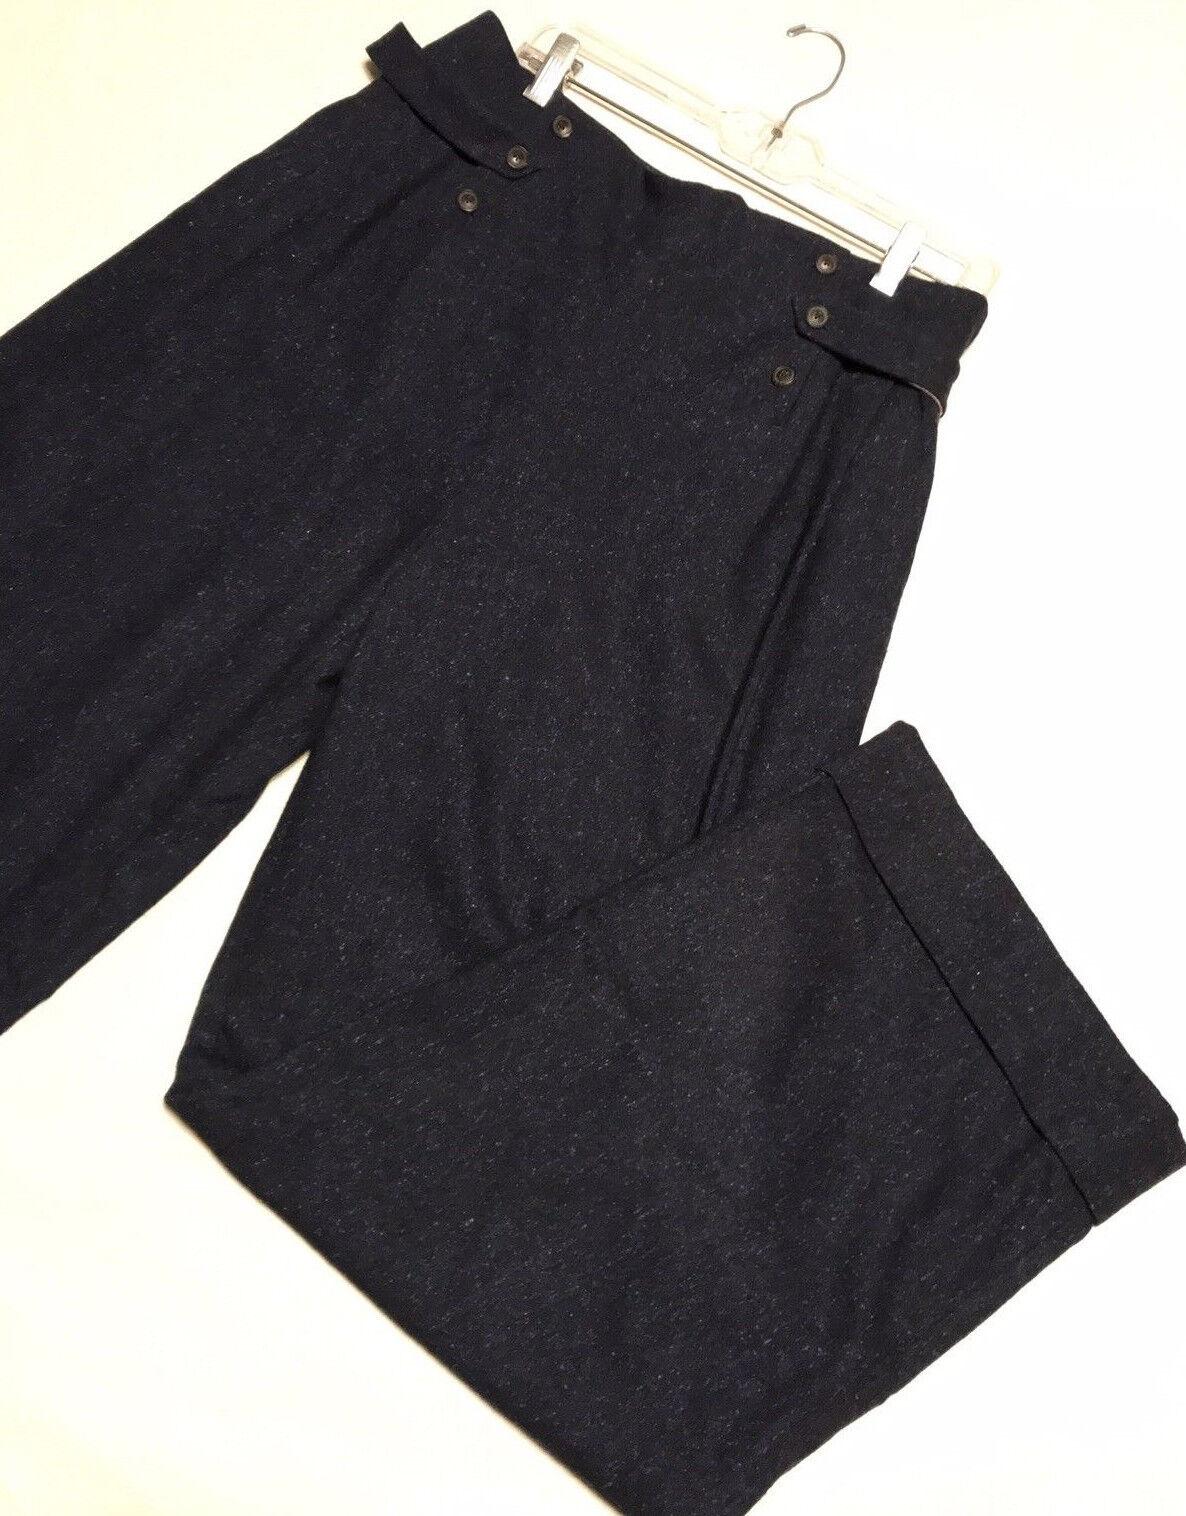 Vintage PORTS Wool Silk Pants bluee Mix Wide Leg Women's Size 12